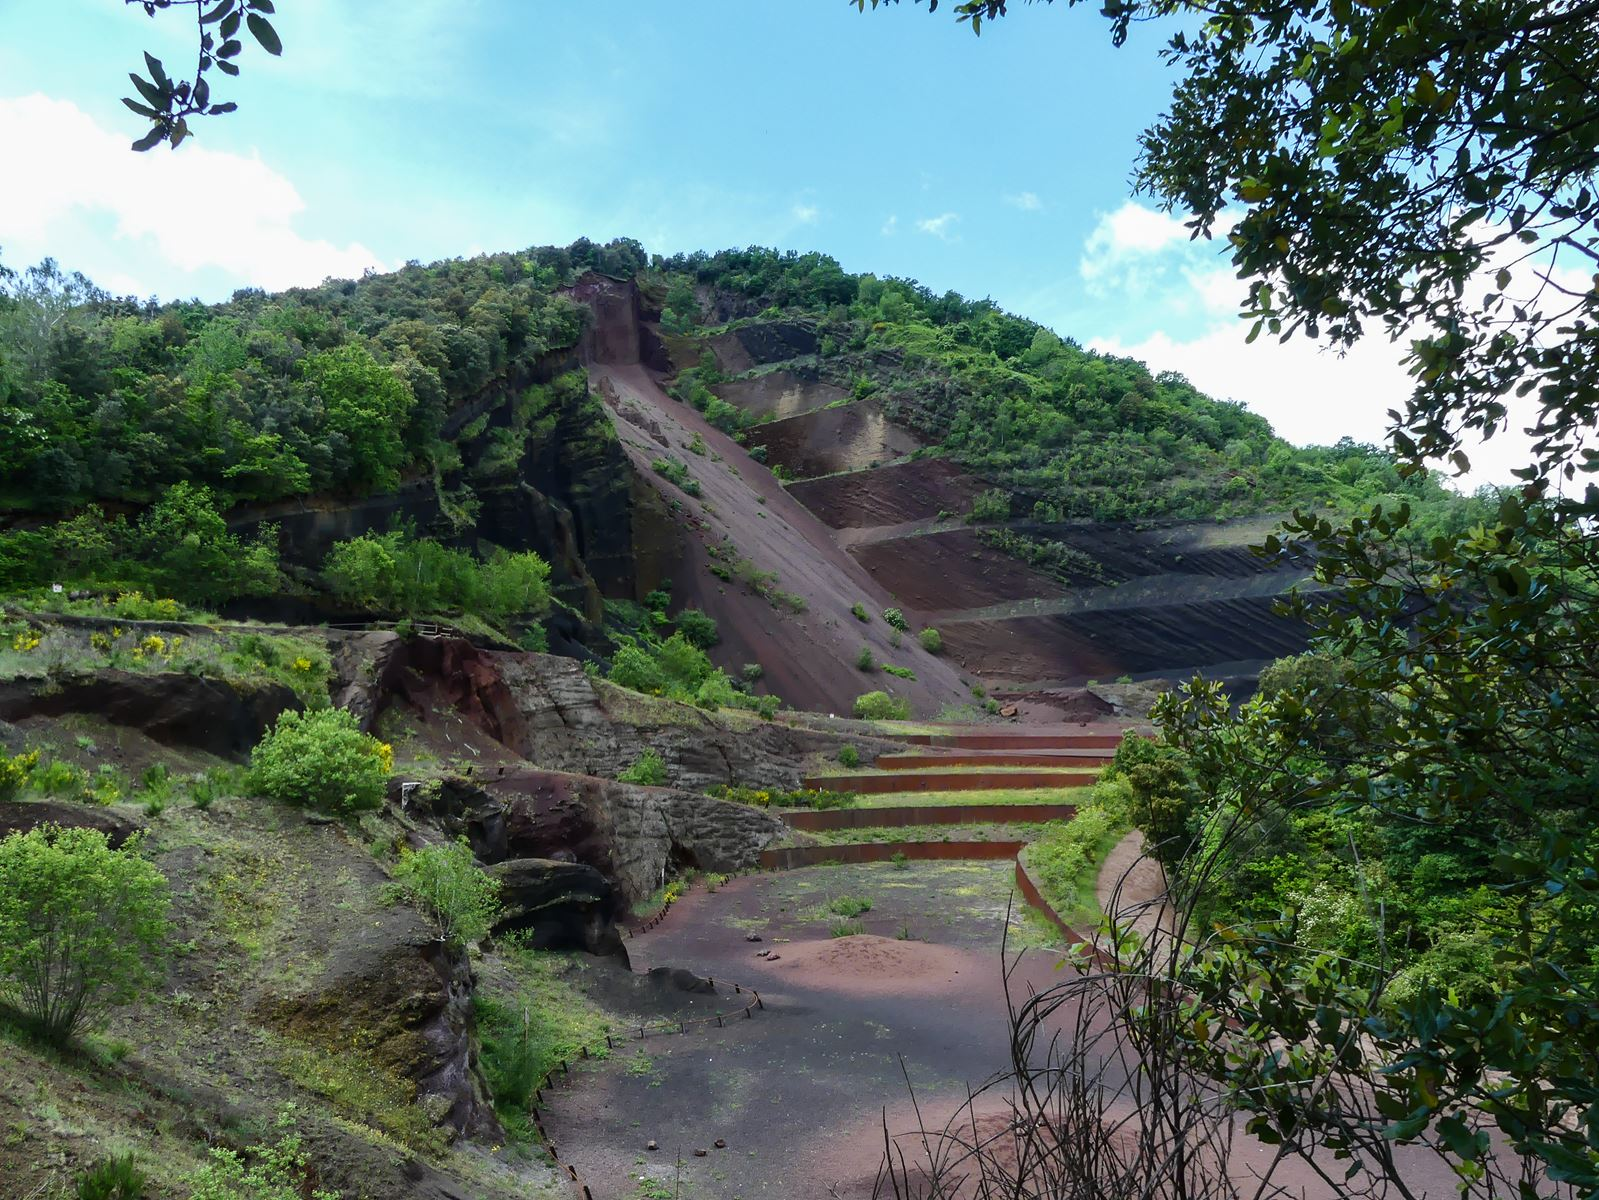 Claironyva Catalogne Garroxta Volcan